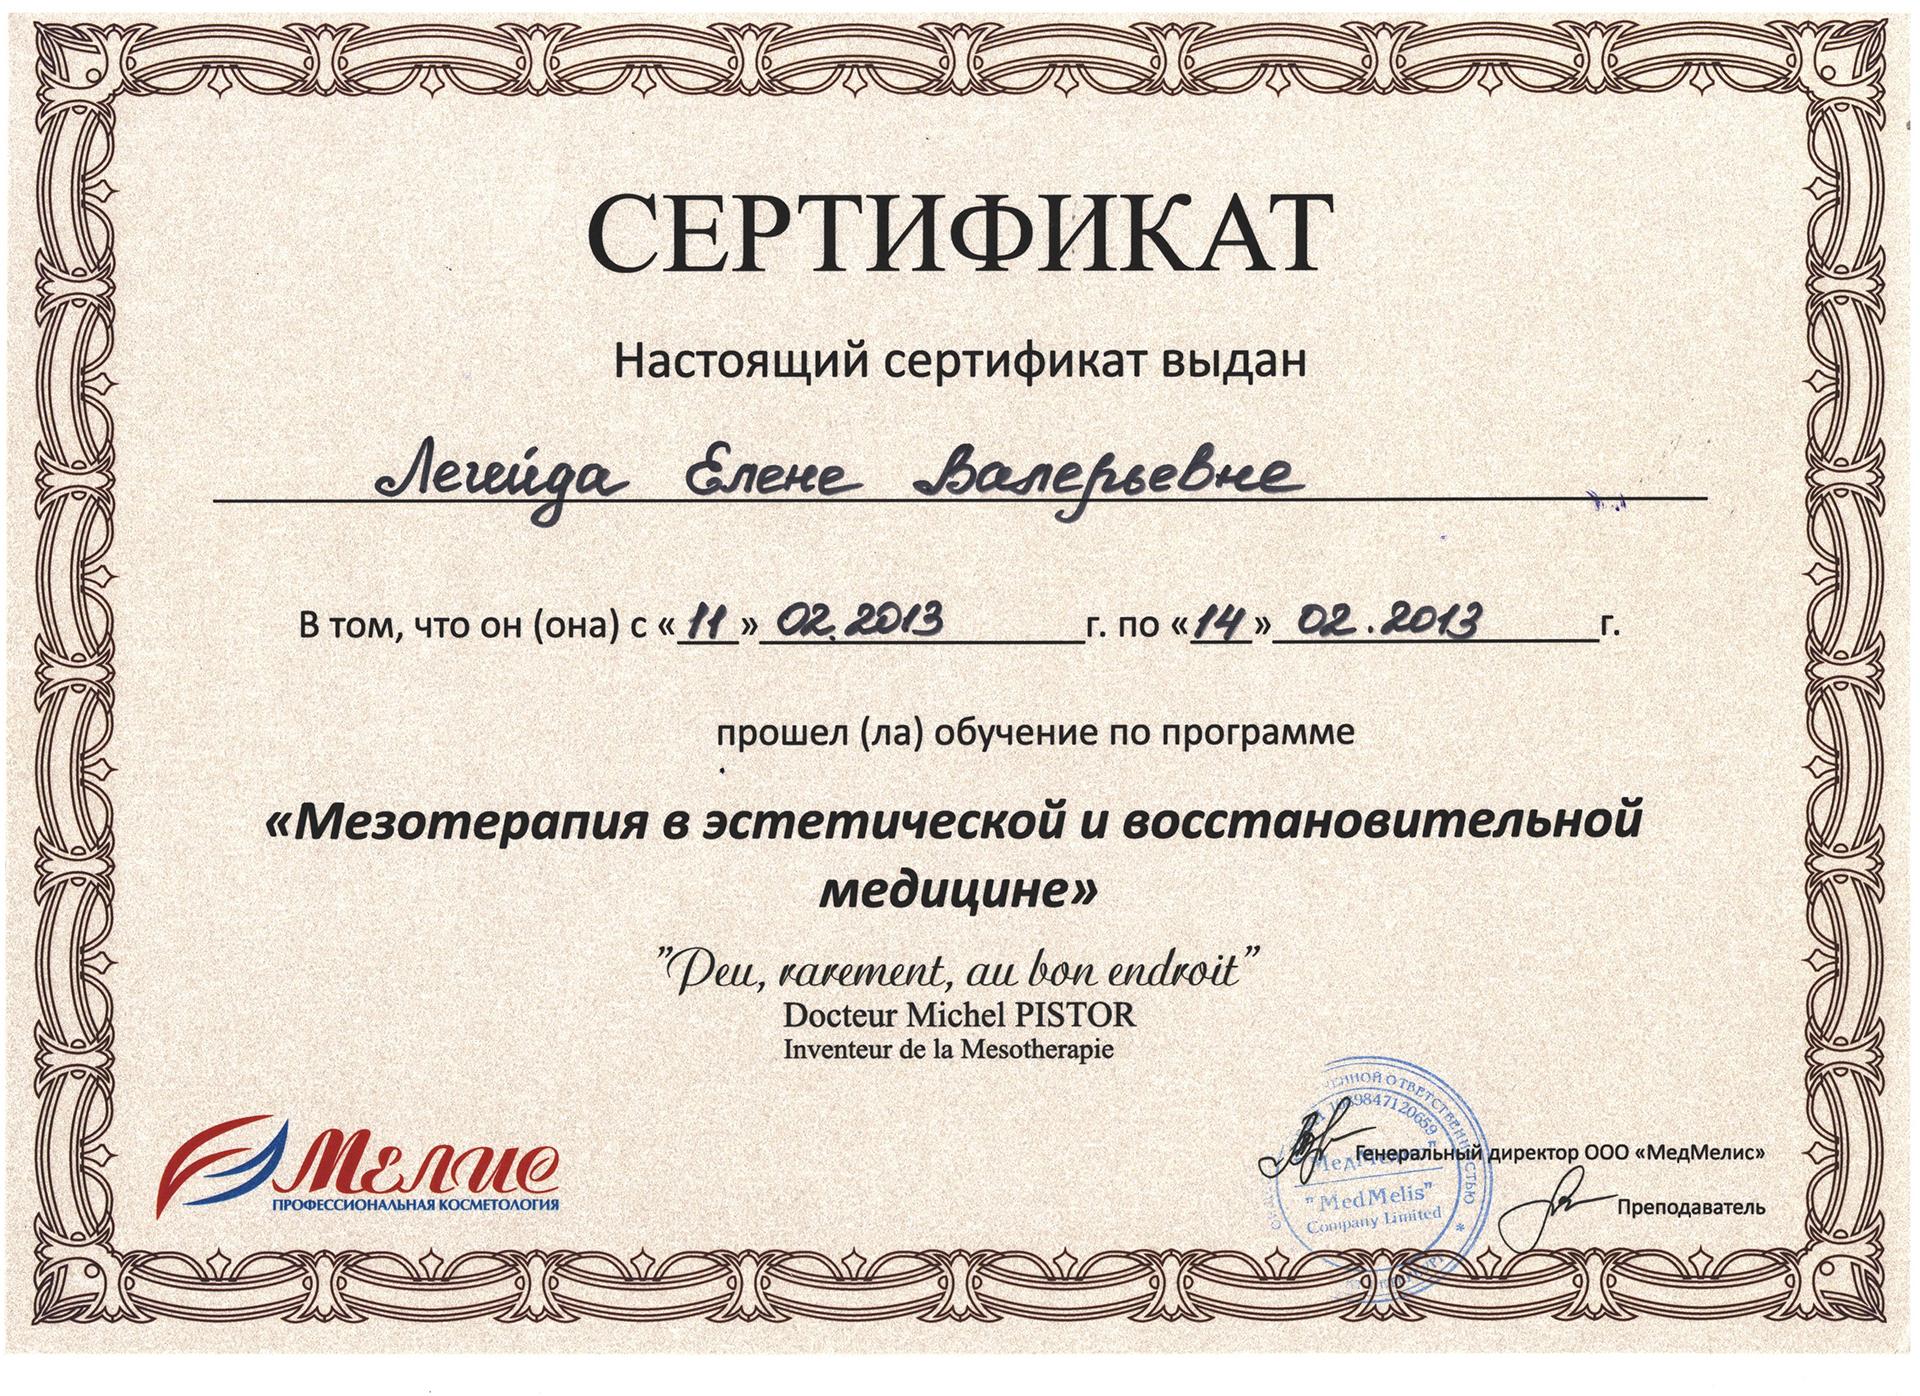 Сертификат — Мезотерапия в медицине. Легейда Елена Валерьевна